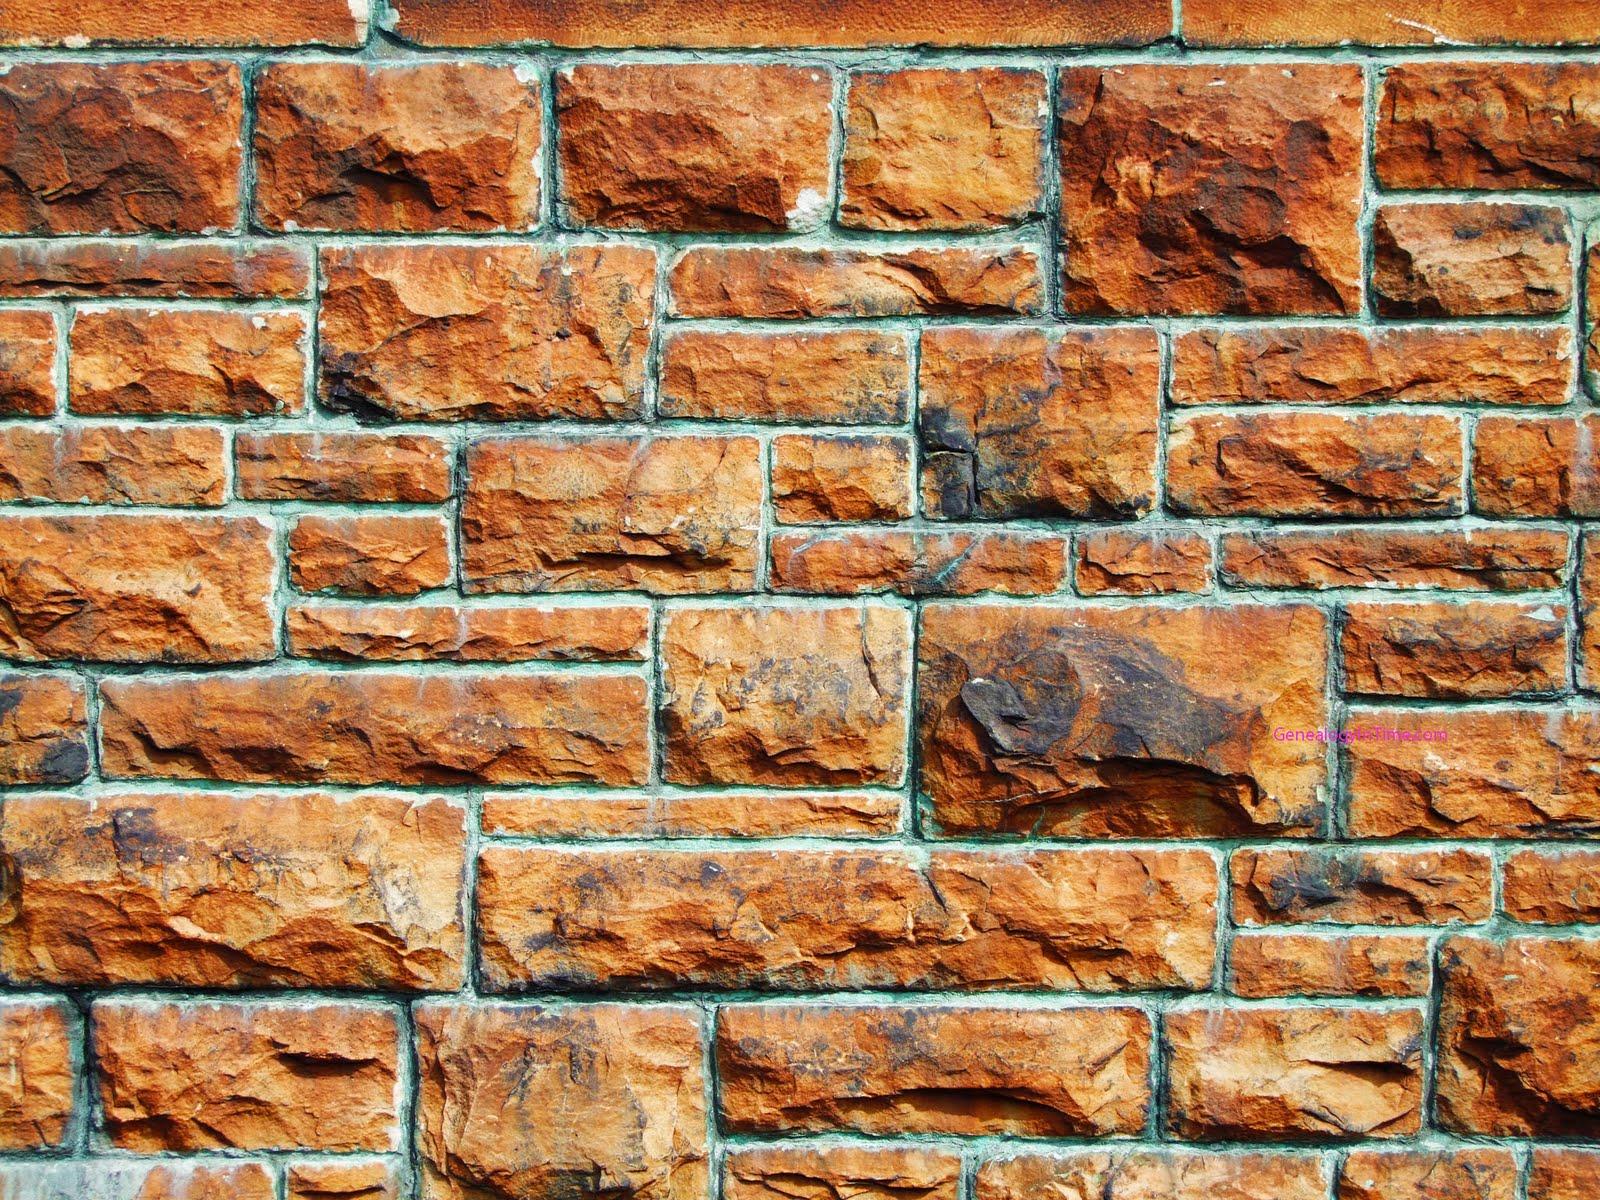 http://3.bp.blogspot.com/-WjeFnnIswD8/TscZIZzgAHI/AAAAAAAAA6s/Wz0kkRiSLUo/s1600/brick-wallpaper-hd-6-743910.jpg